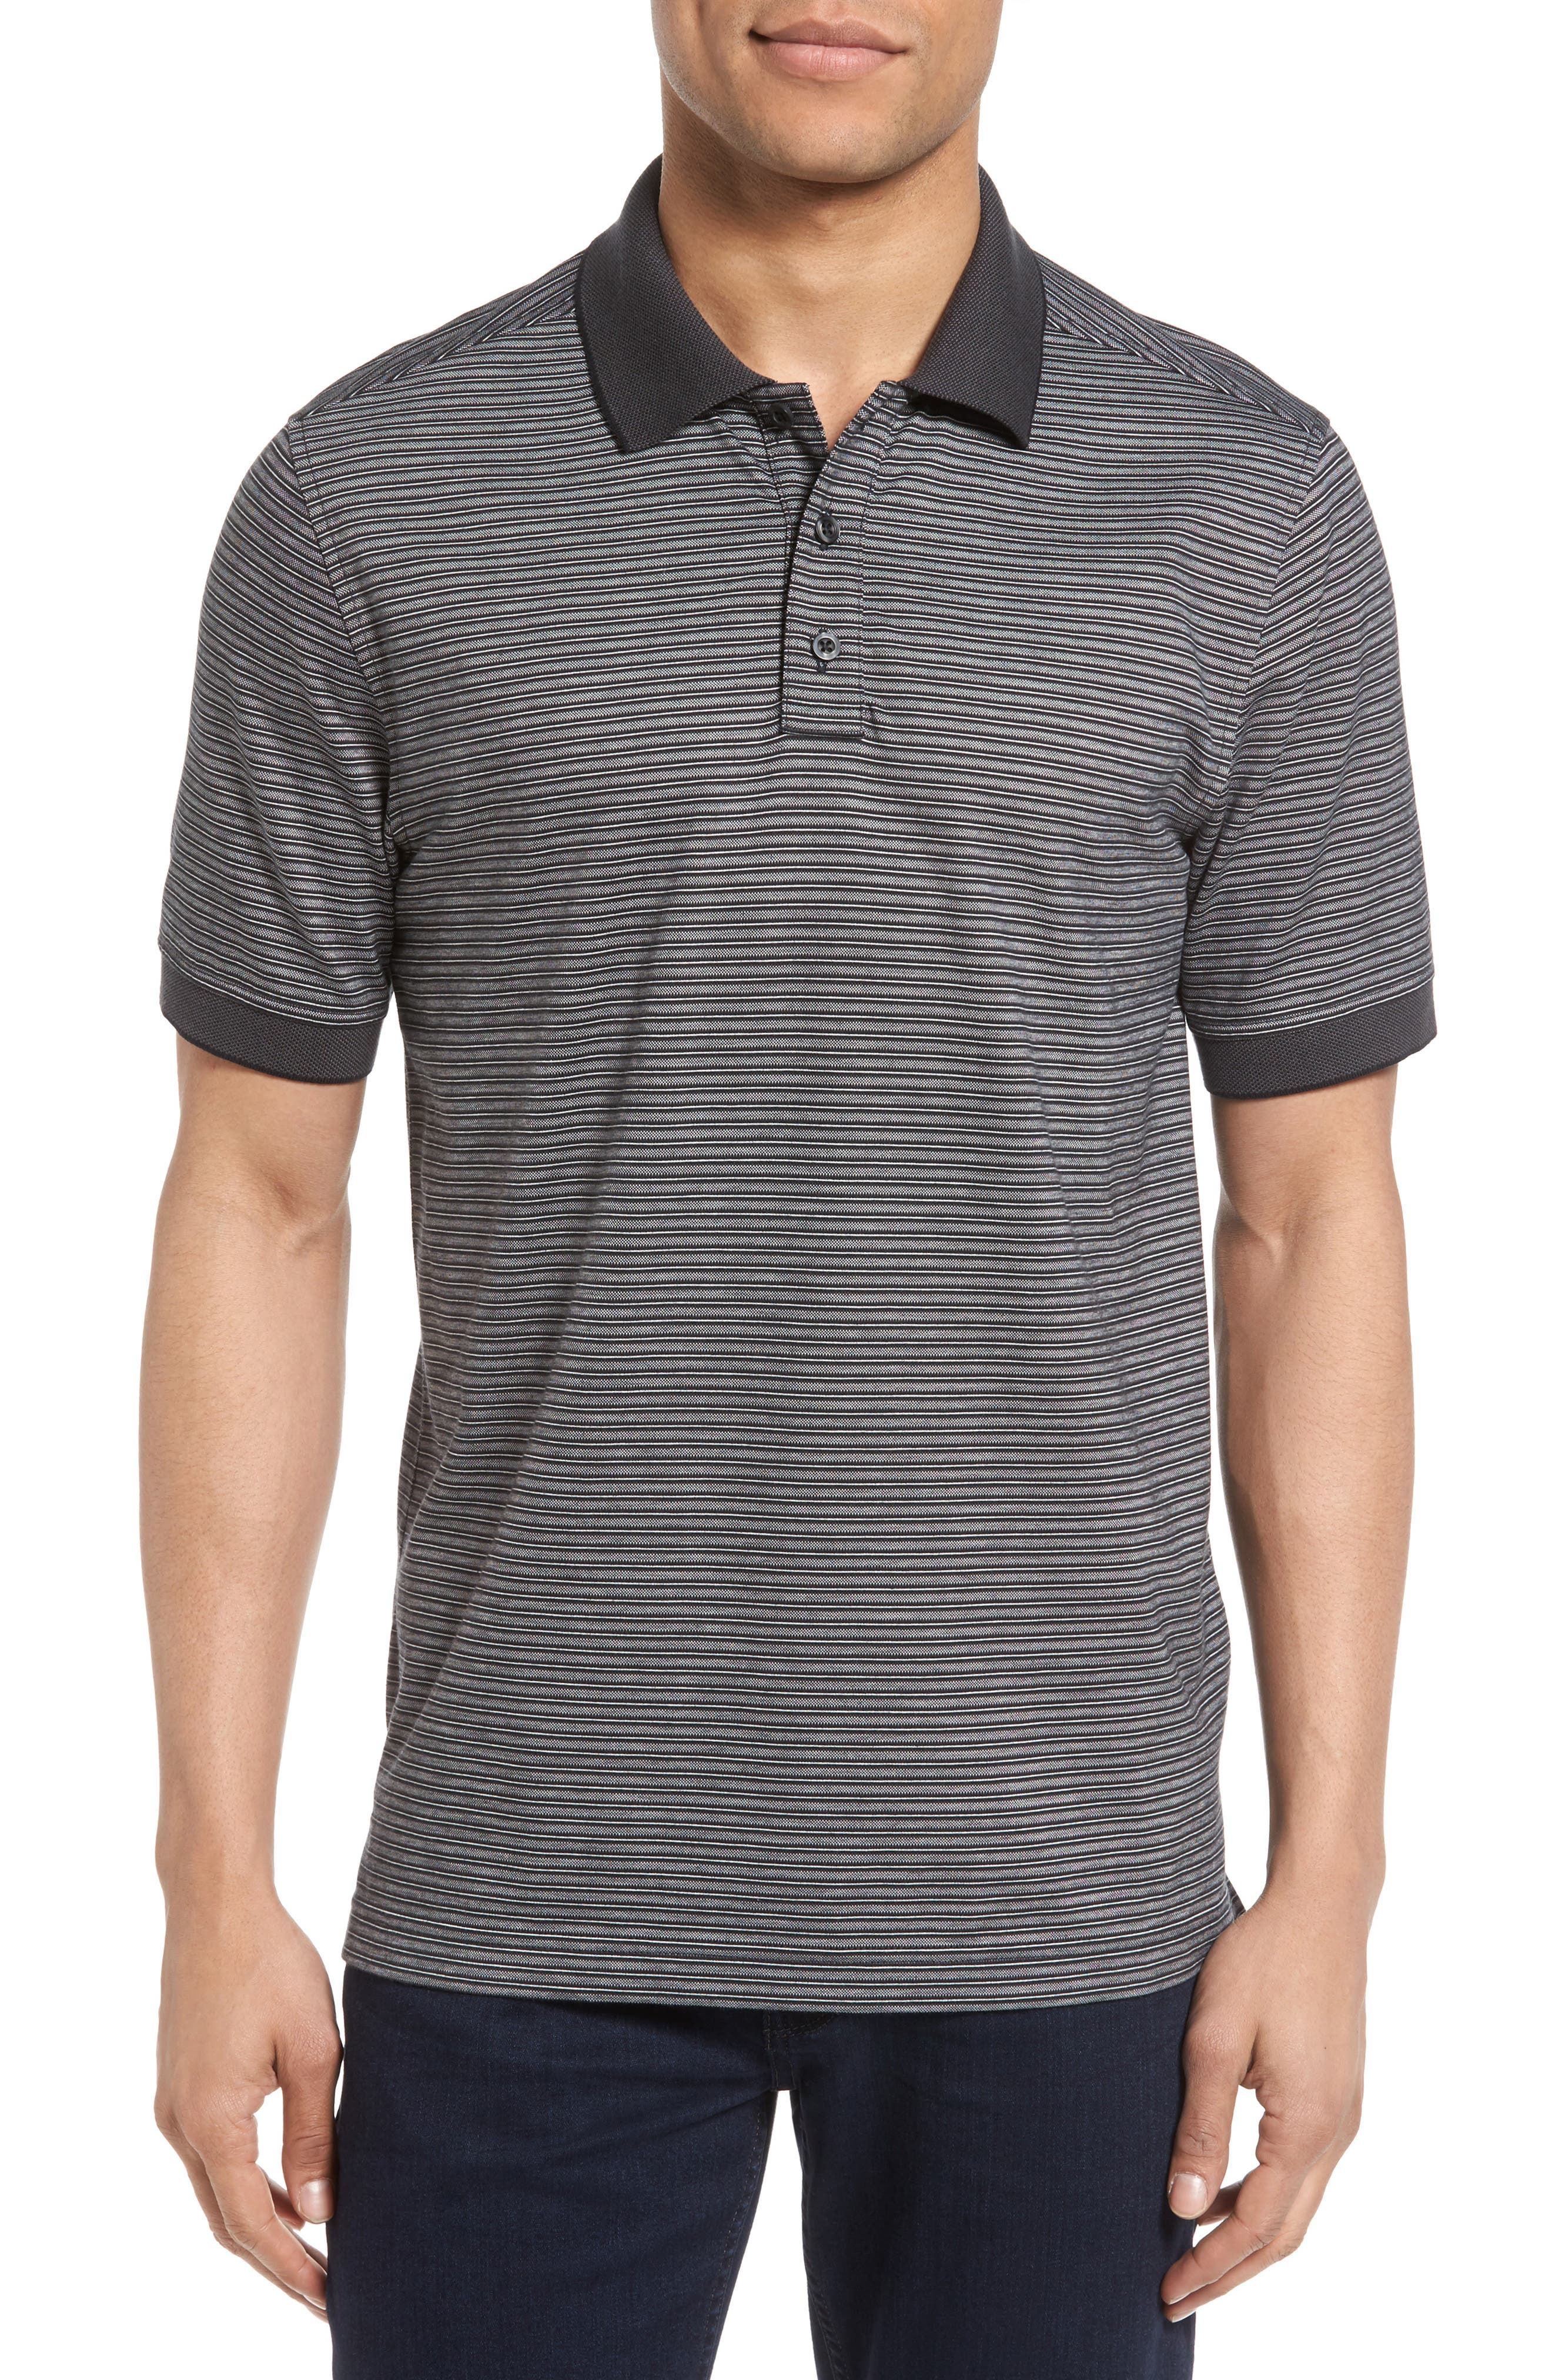 Regular Fit Performance Stripe Polo,                         Main,                         color, Grey Shade Multi Stripe